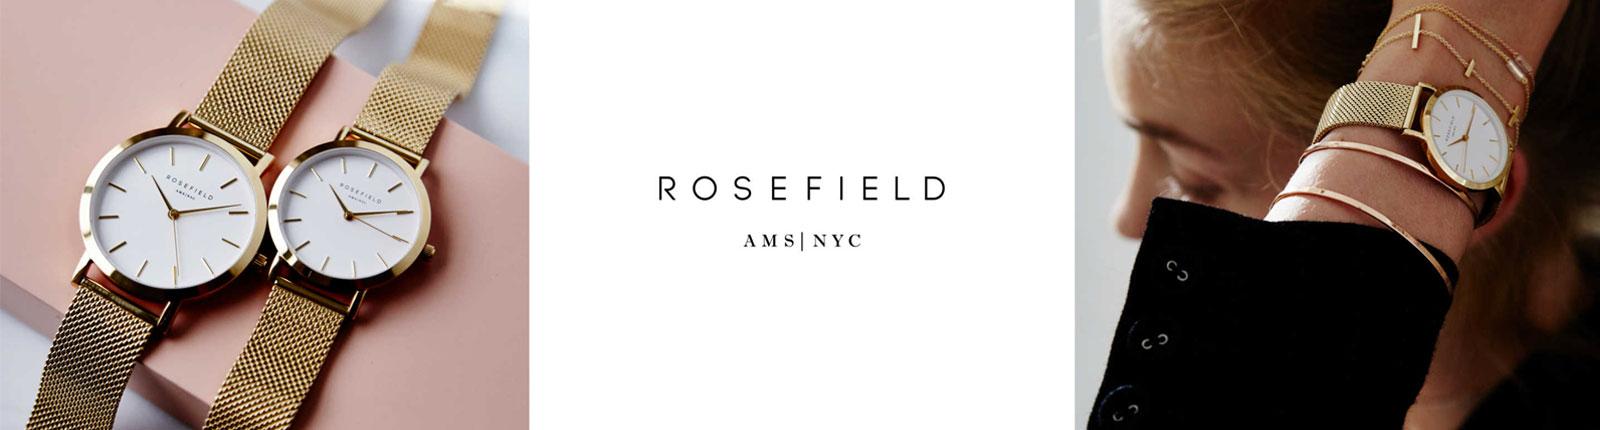 Rosefield-Uhren